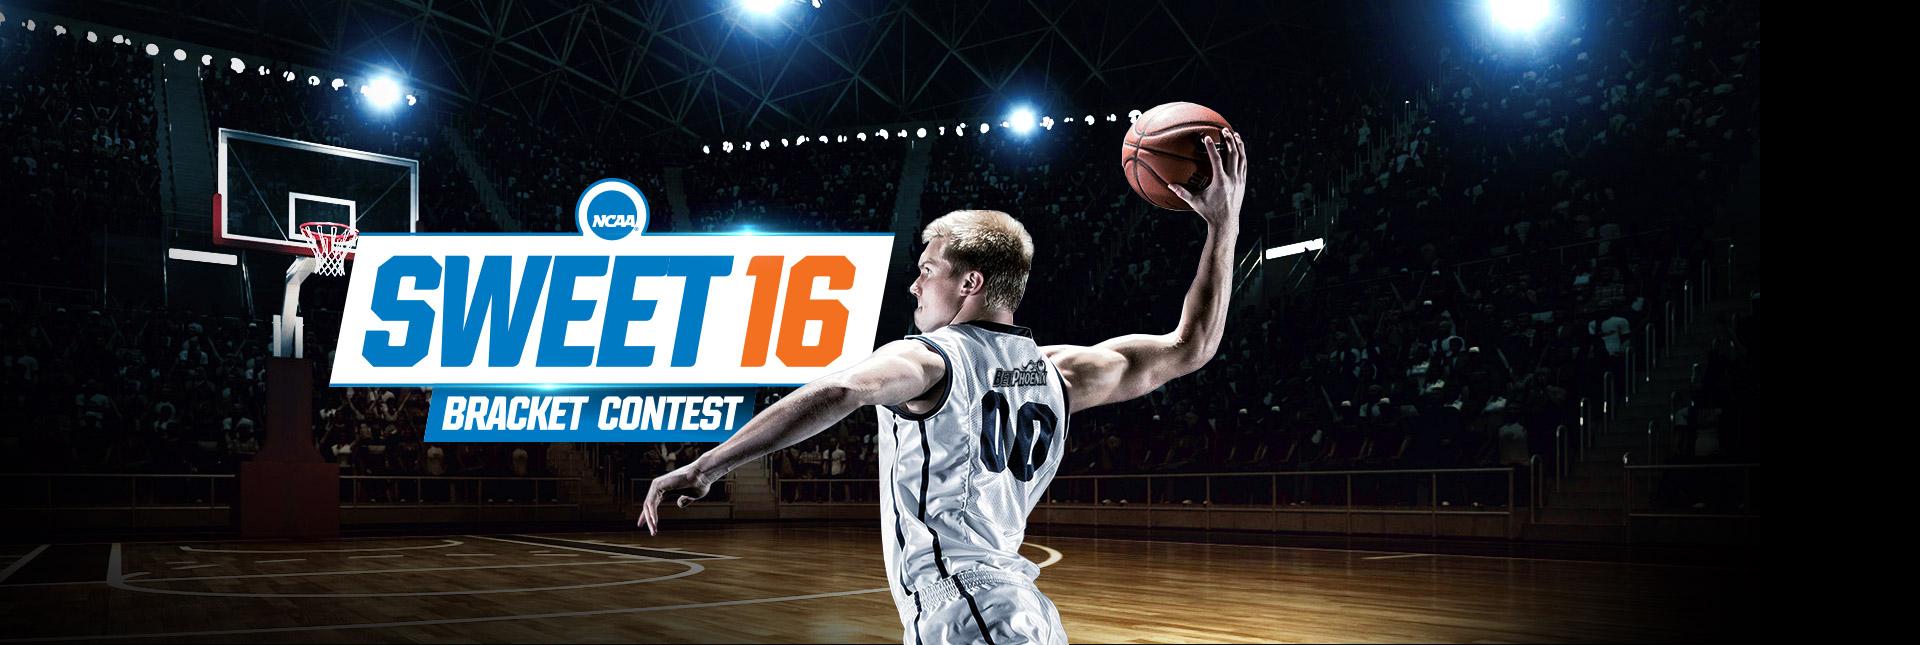 Sweet 16 Bracket Contest